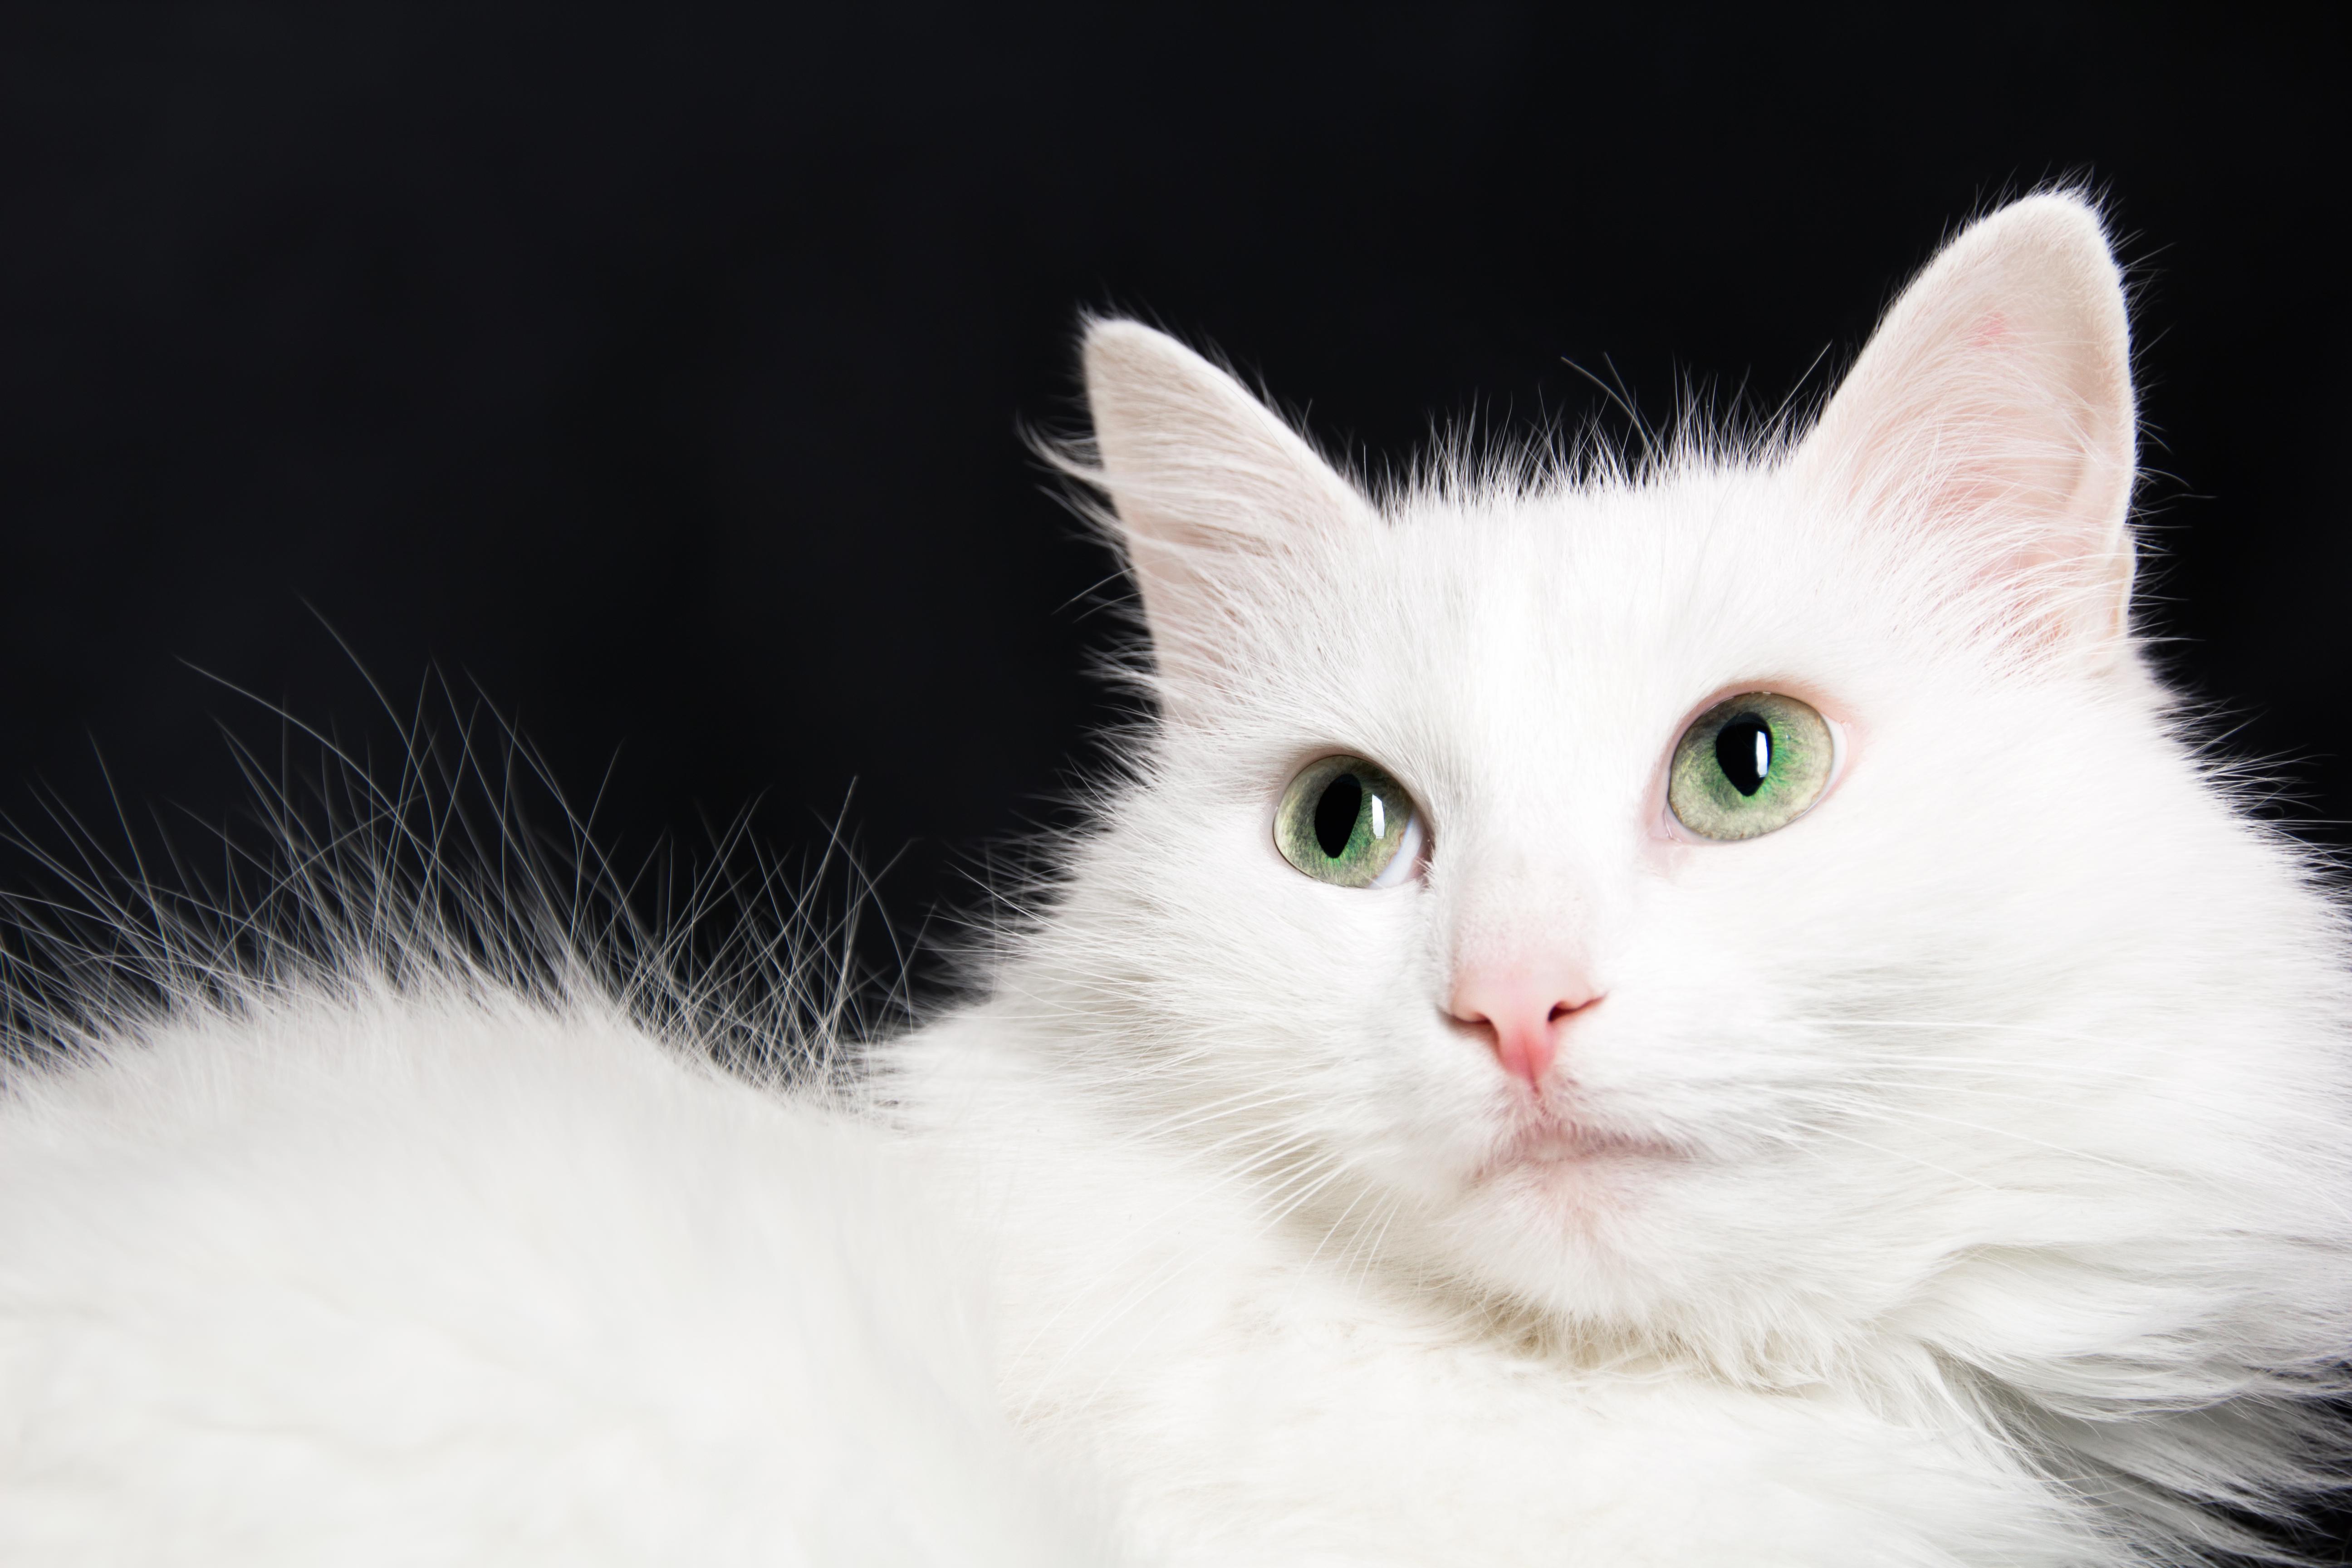 White cat, Cat, Close-up, Domestic, Fluffy, HQ Photo